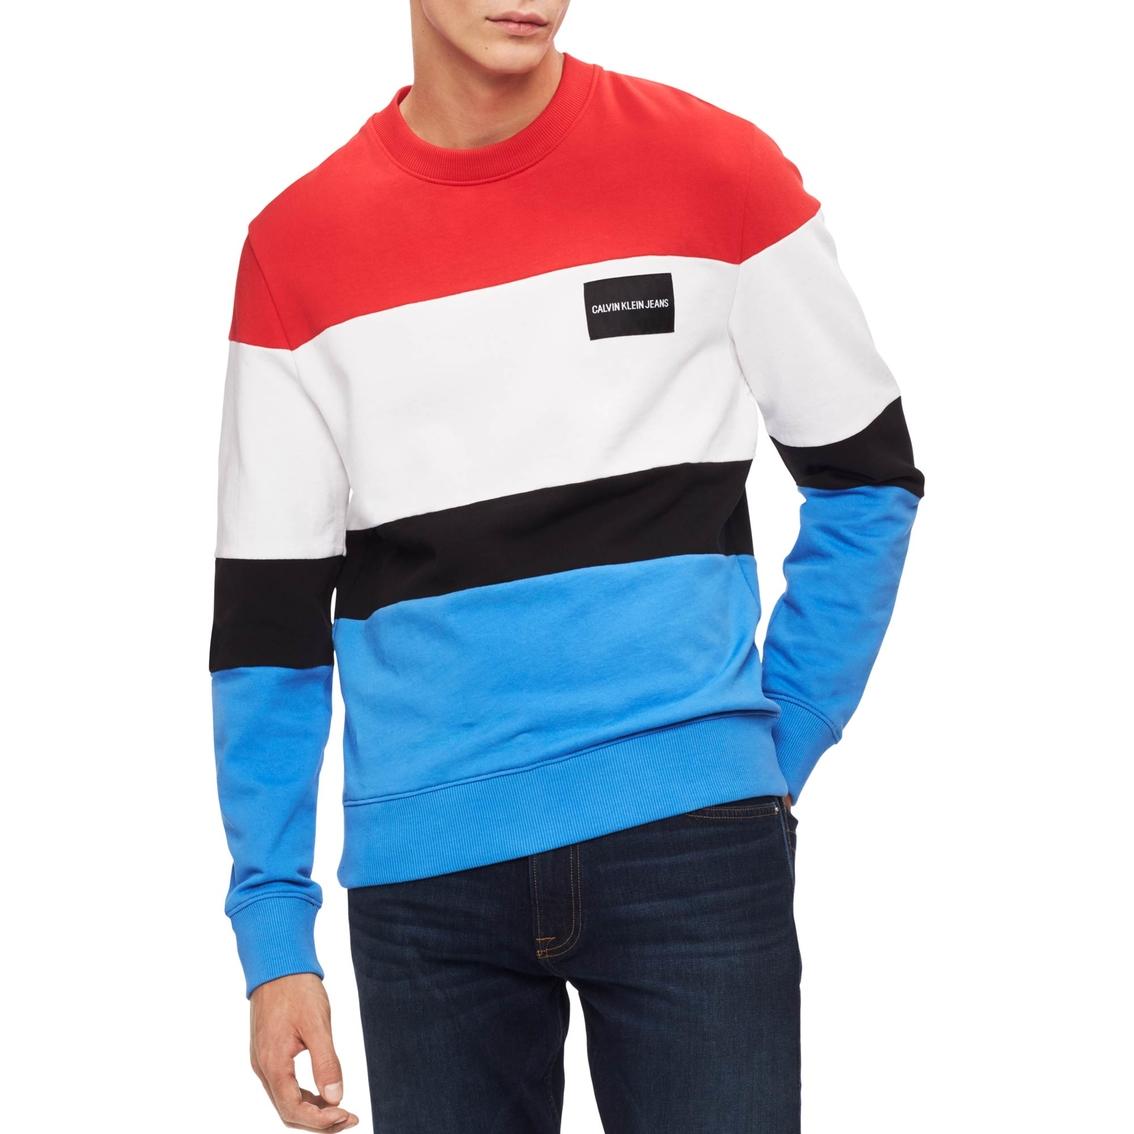 c4d84f0625712 Calvin Klein Jeans Colorblock Sweatshirt